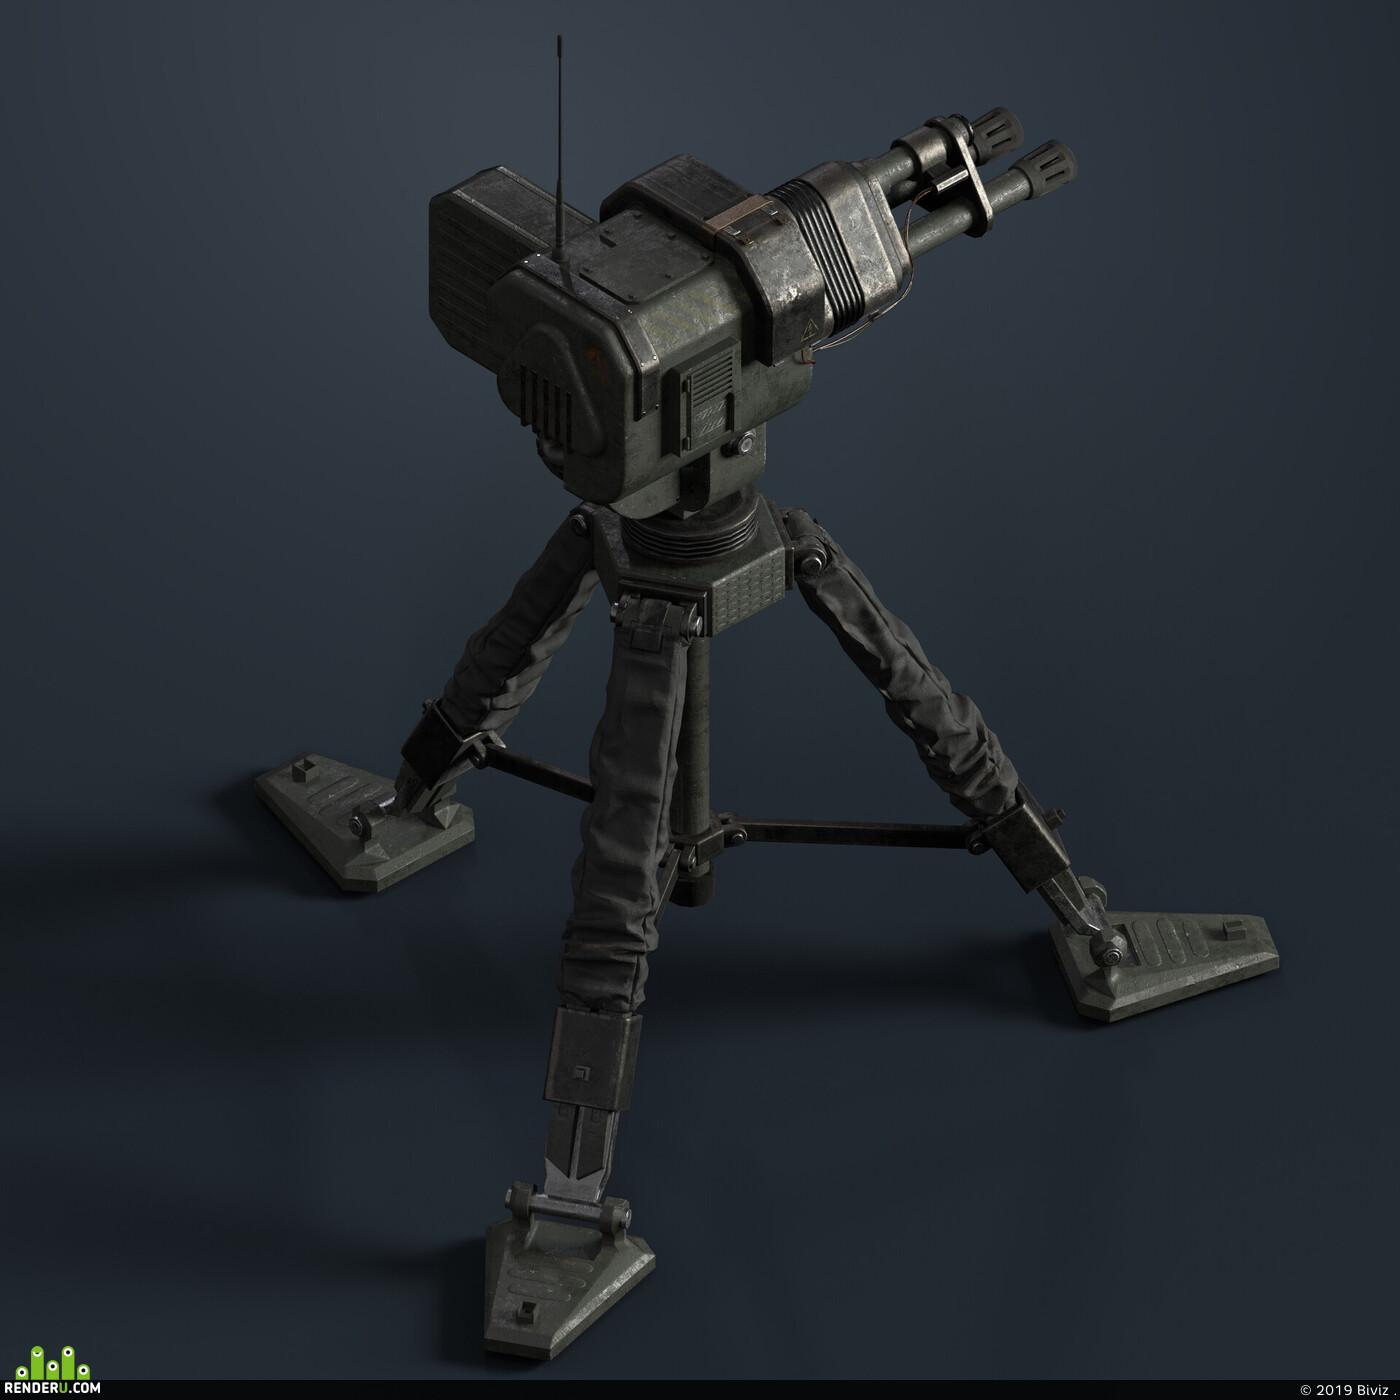 lowpoly, Unreal Engine, Game-ready, PBR, weapons, blender3d, Blender, turret